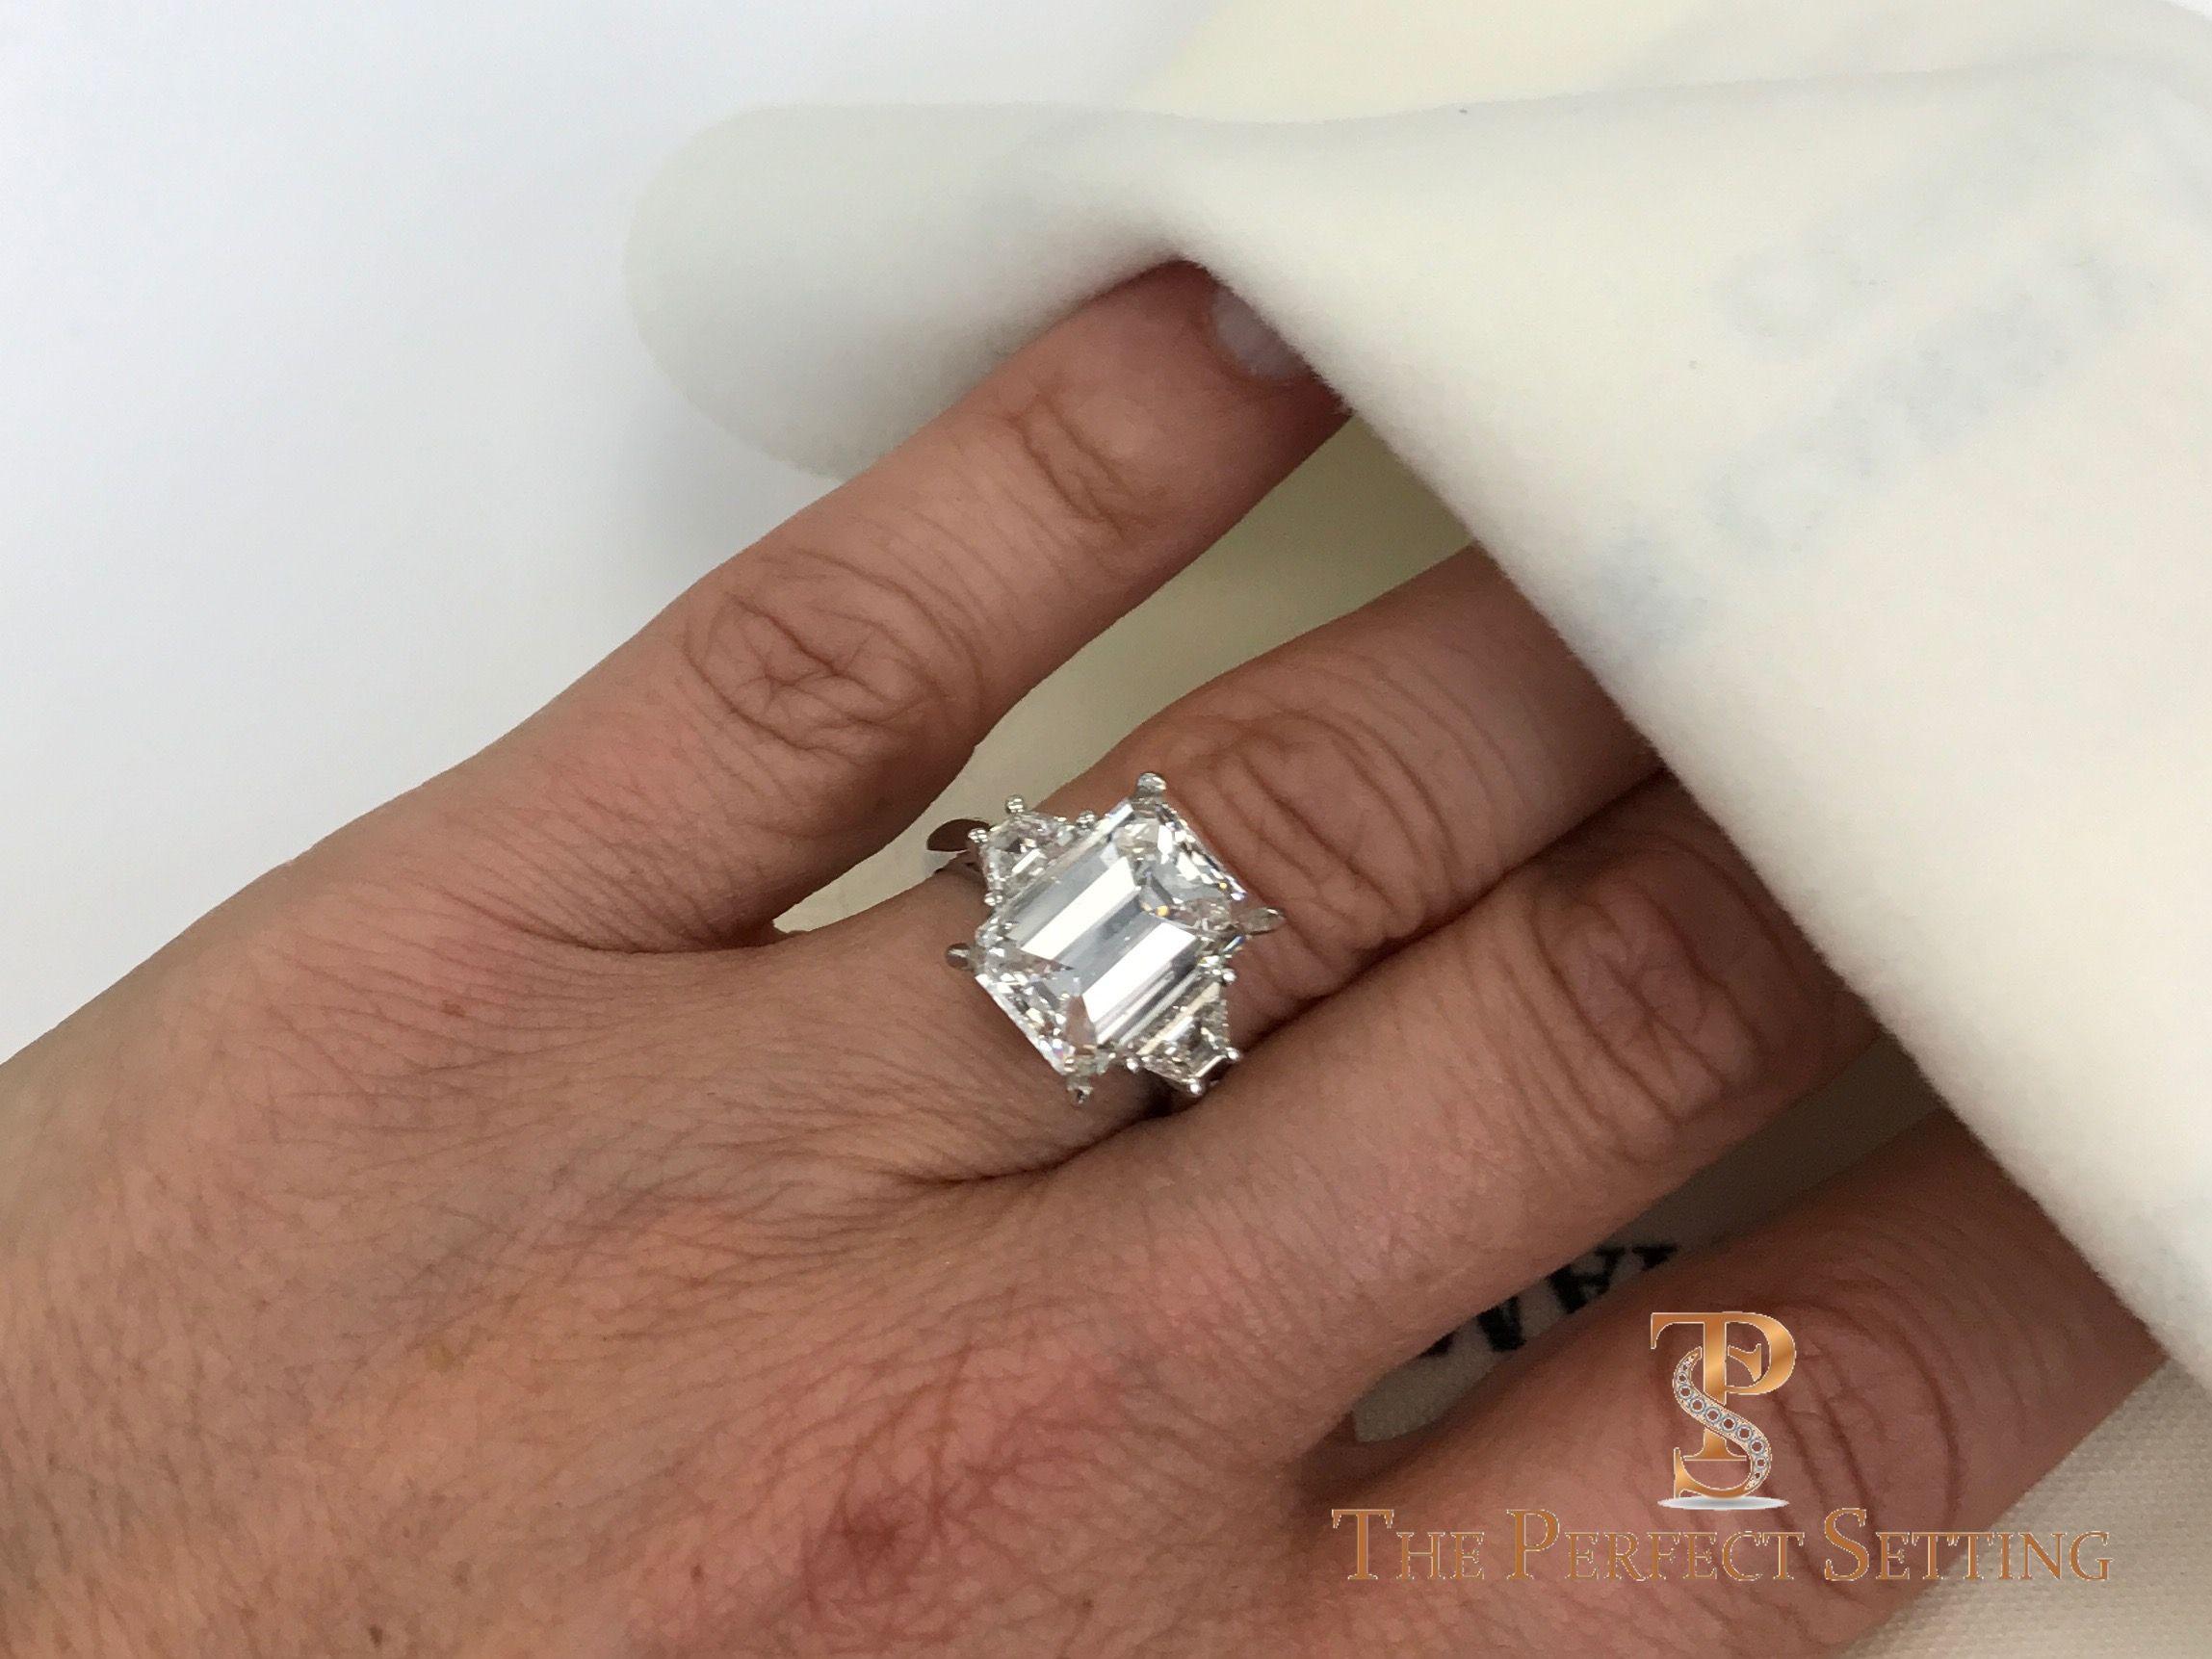 Pin On Engagement Ring Selfies